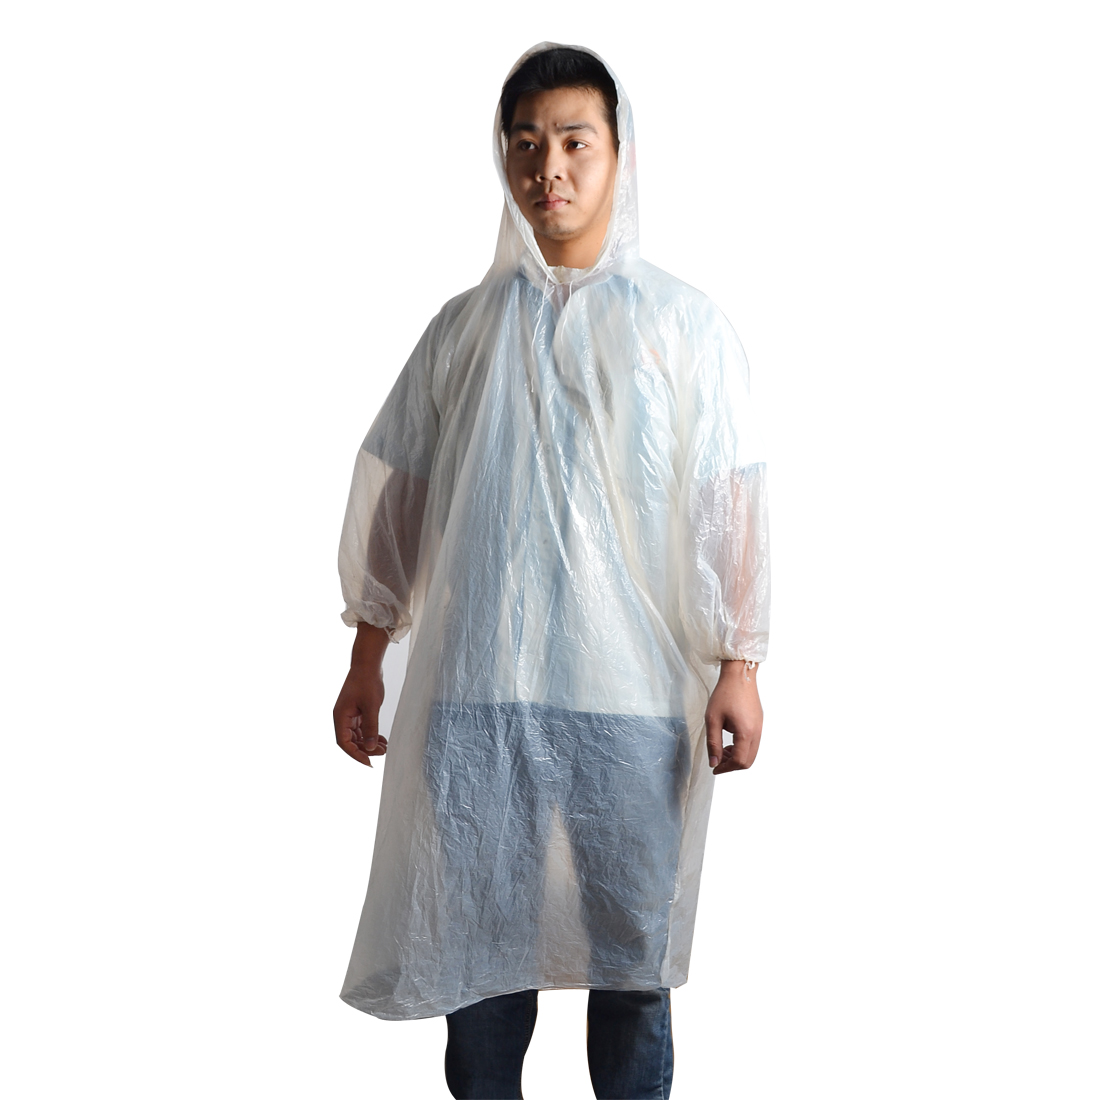 Woman Man Adult Clear White Disposable Rain Coat Hooded Poncho Raincoat